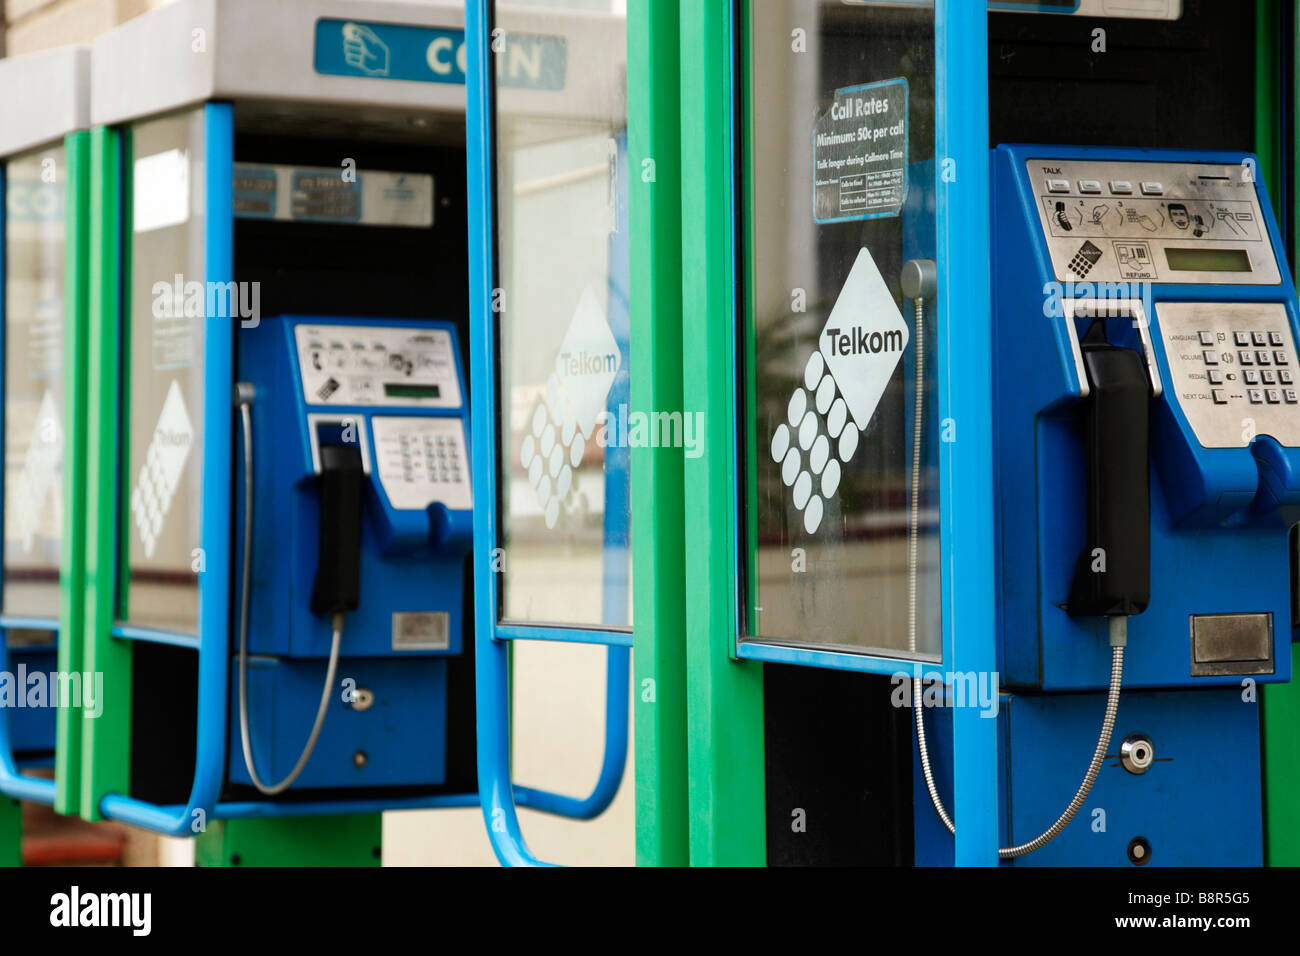 empty public payphone telephone kiosks voortrek street swellendam south africa - Stock Image